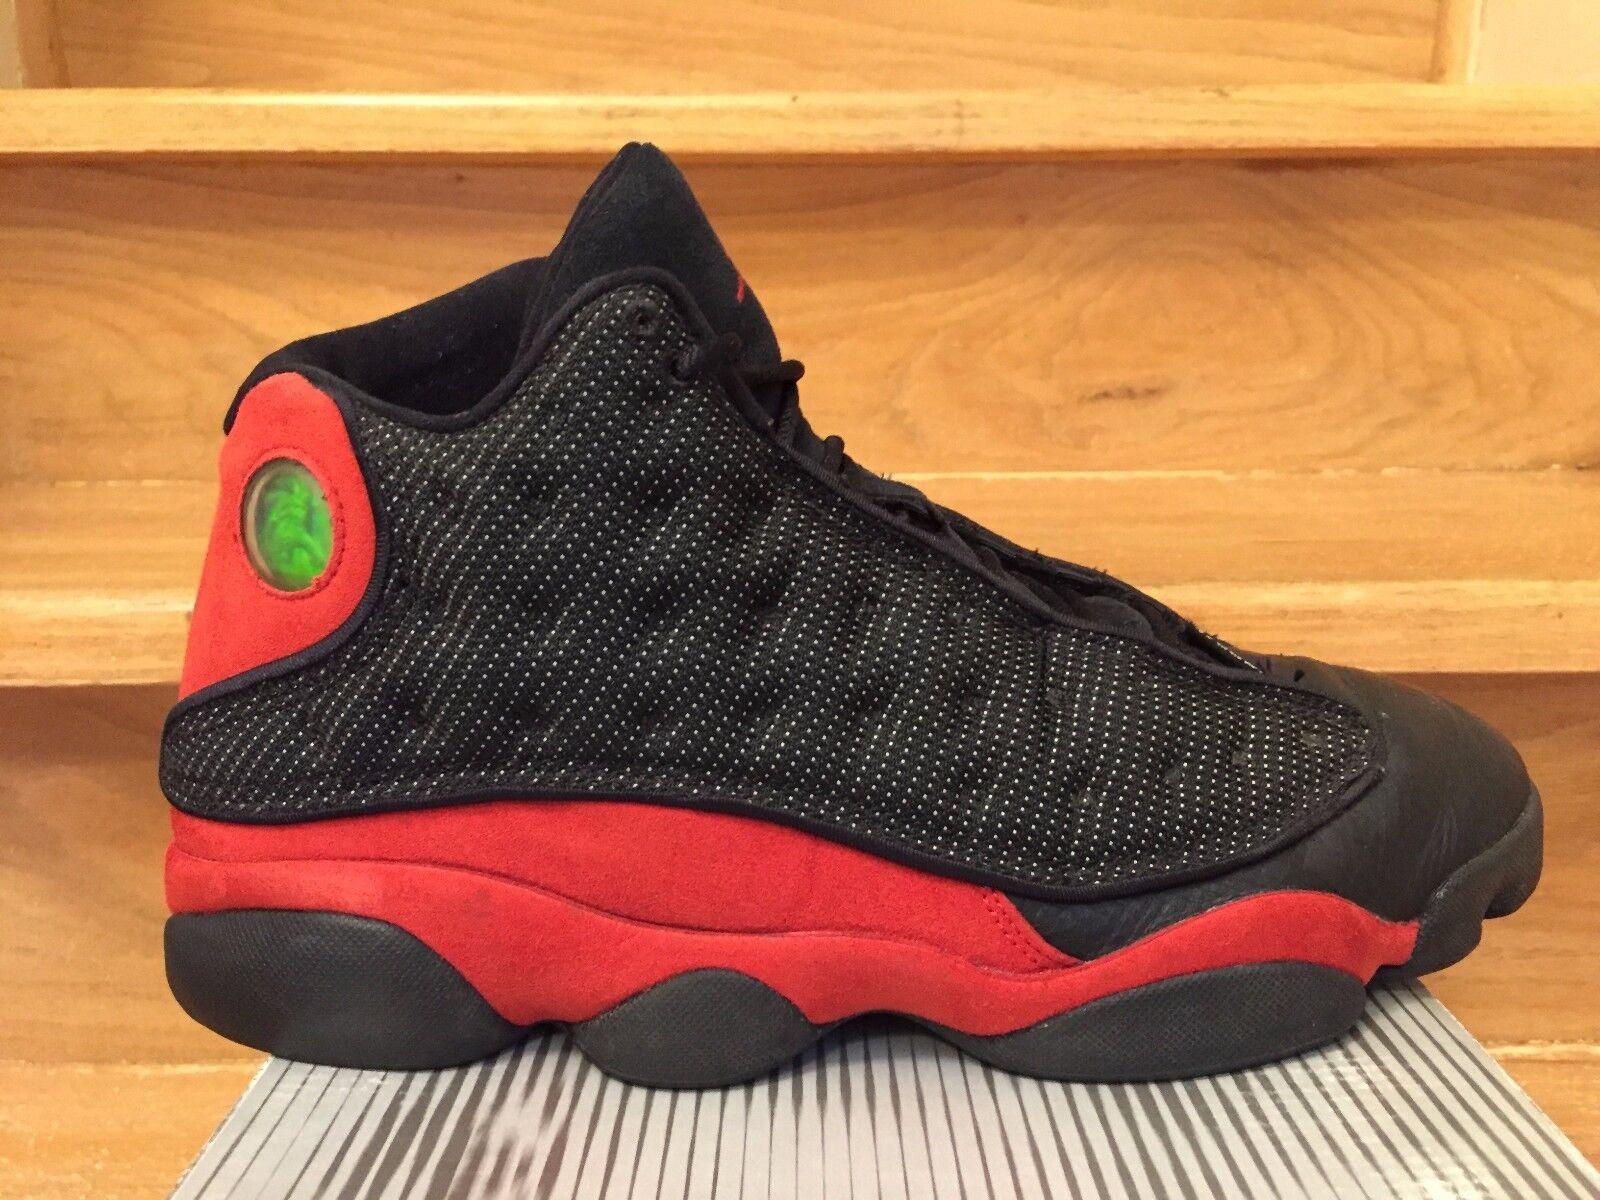 2004 Nike Air Jordan 13 Retro Bred Black/True Red/3M Reflective Size 10.5 Shoes